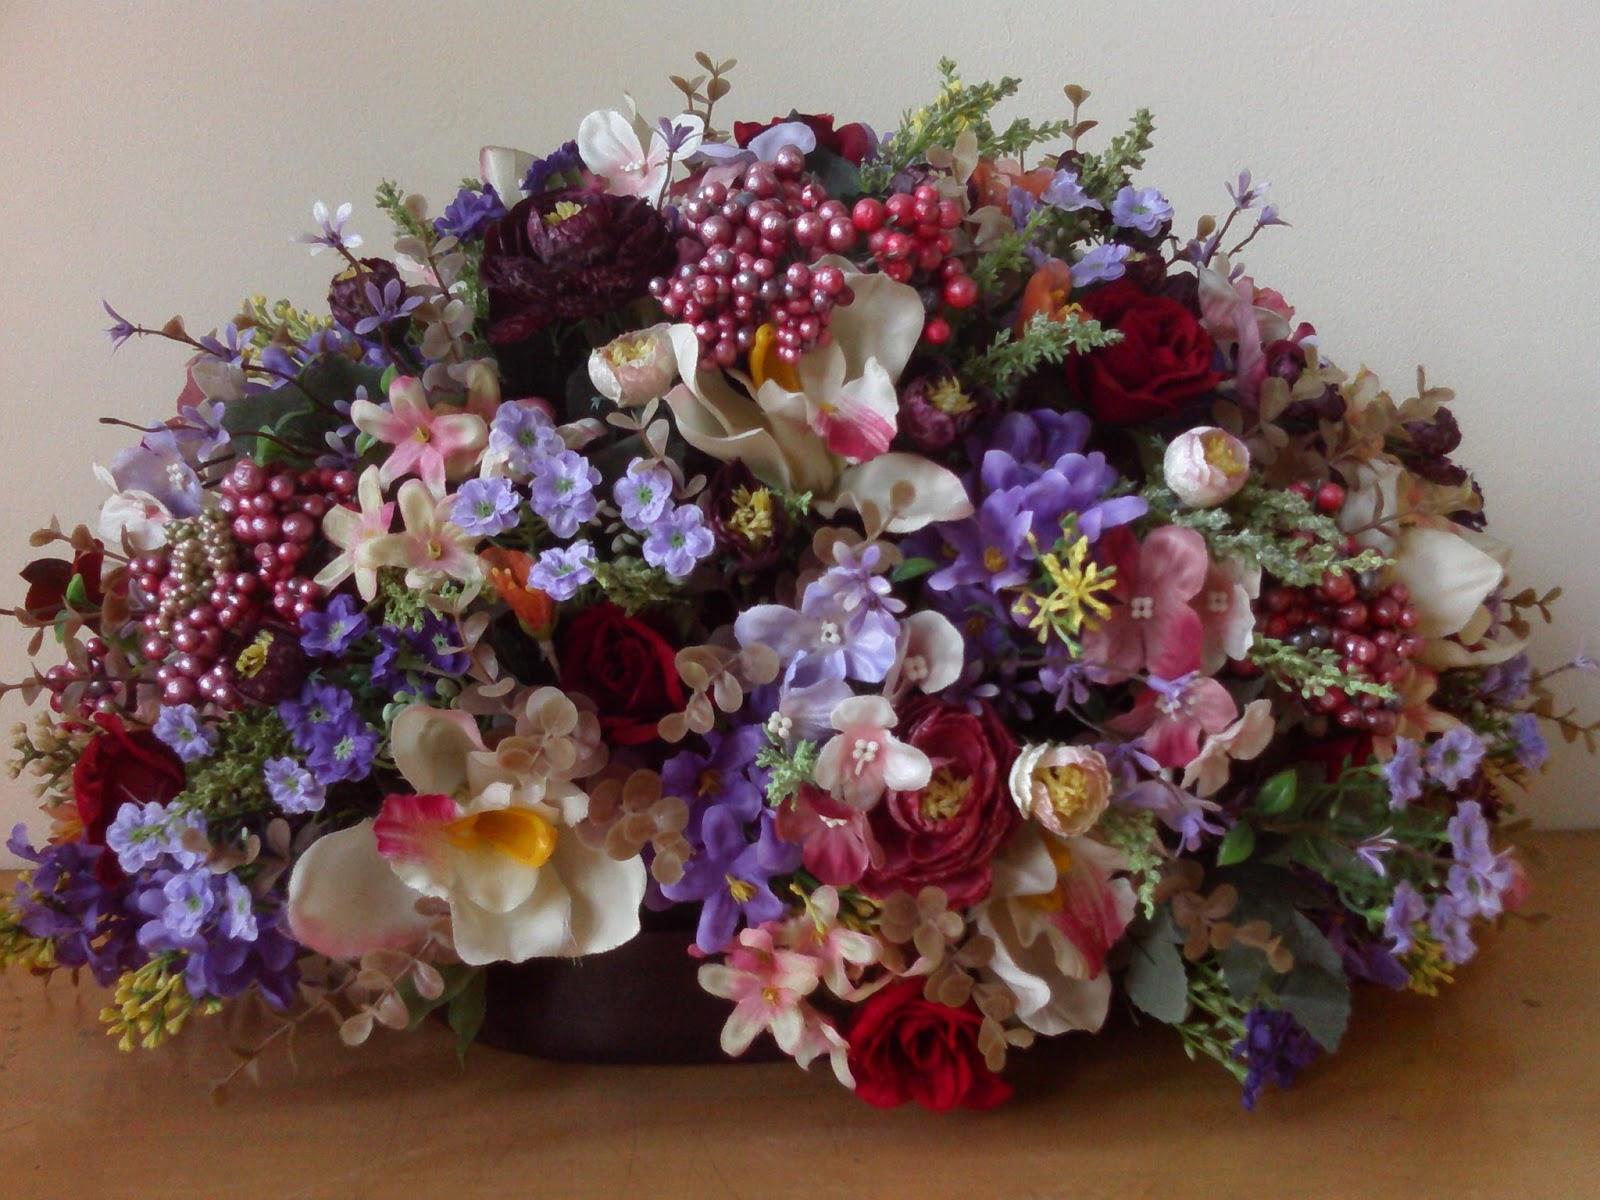 Tulipa Artificial Flower Shop Bunga Impor Berikut Beberapa Contoh Rangkaian Terbaru Dari Kami